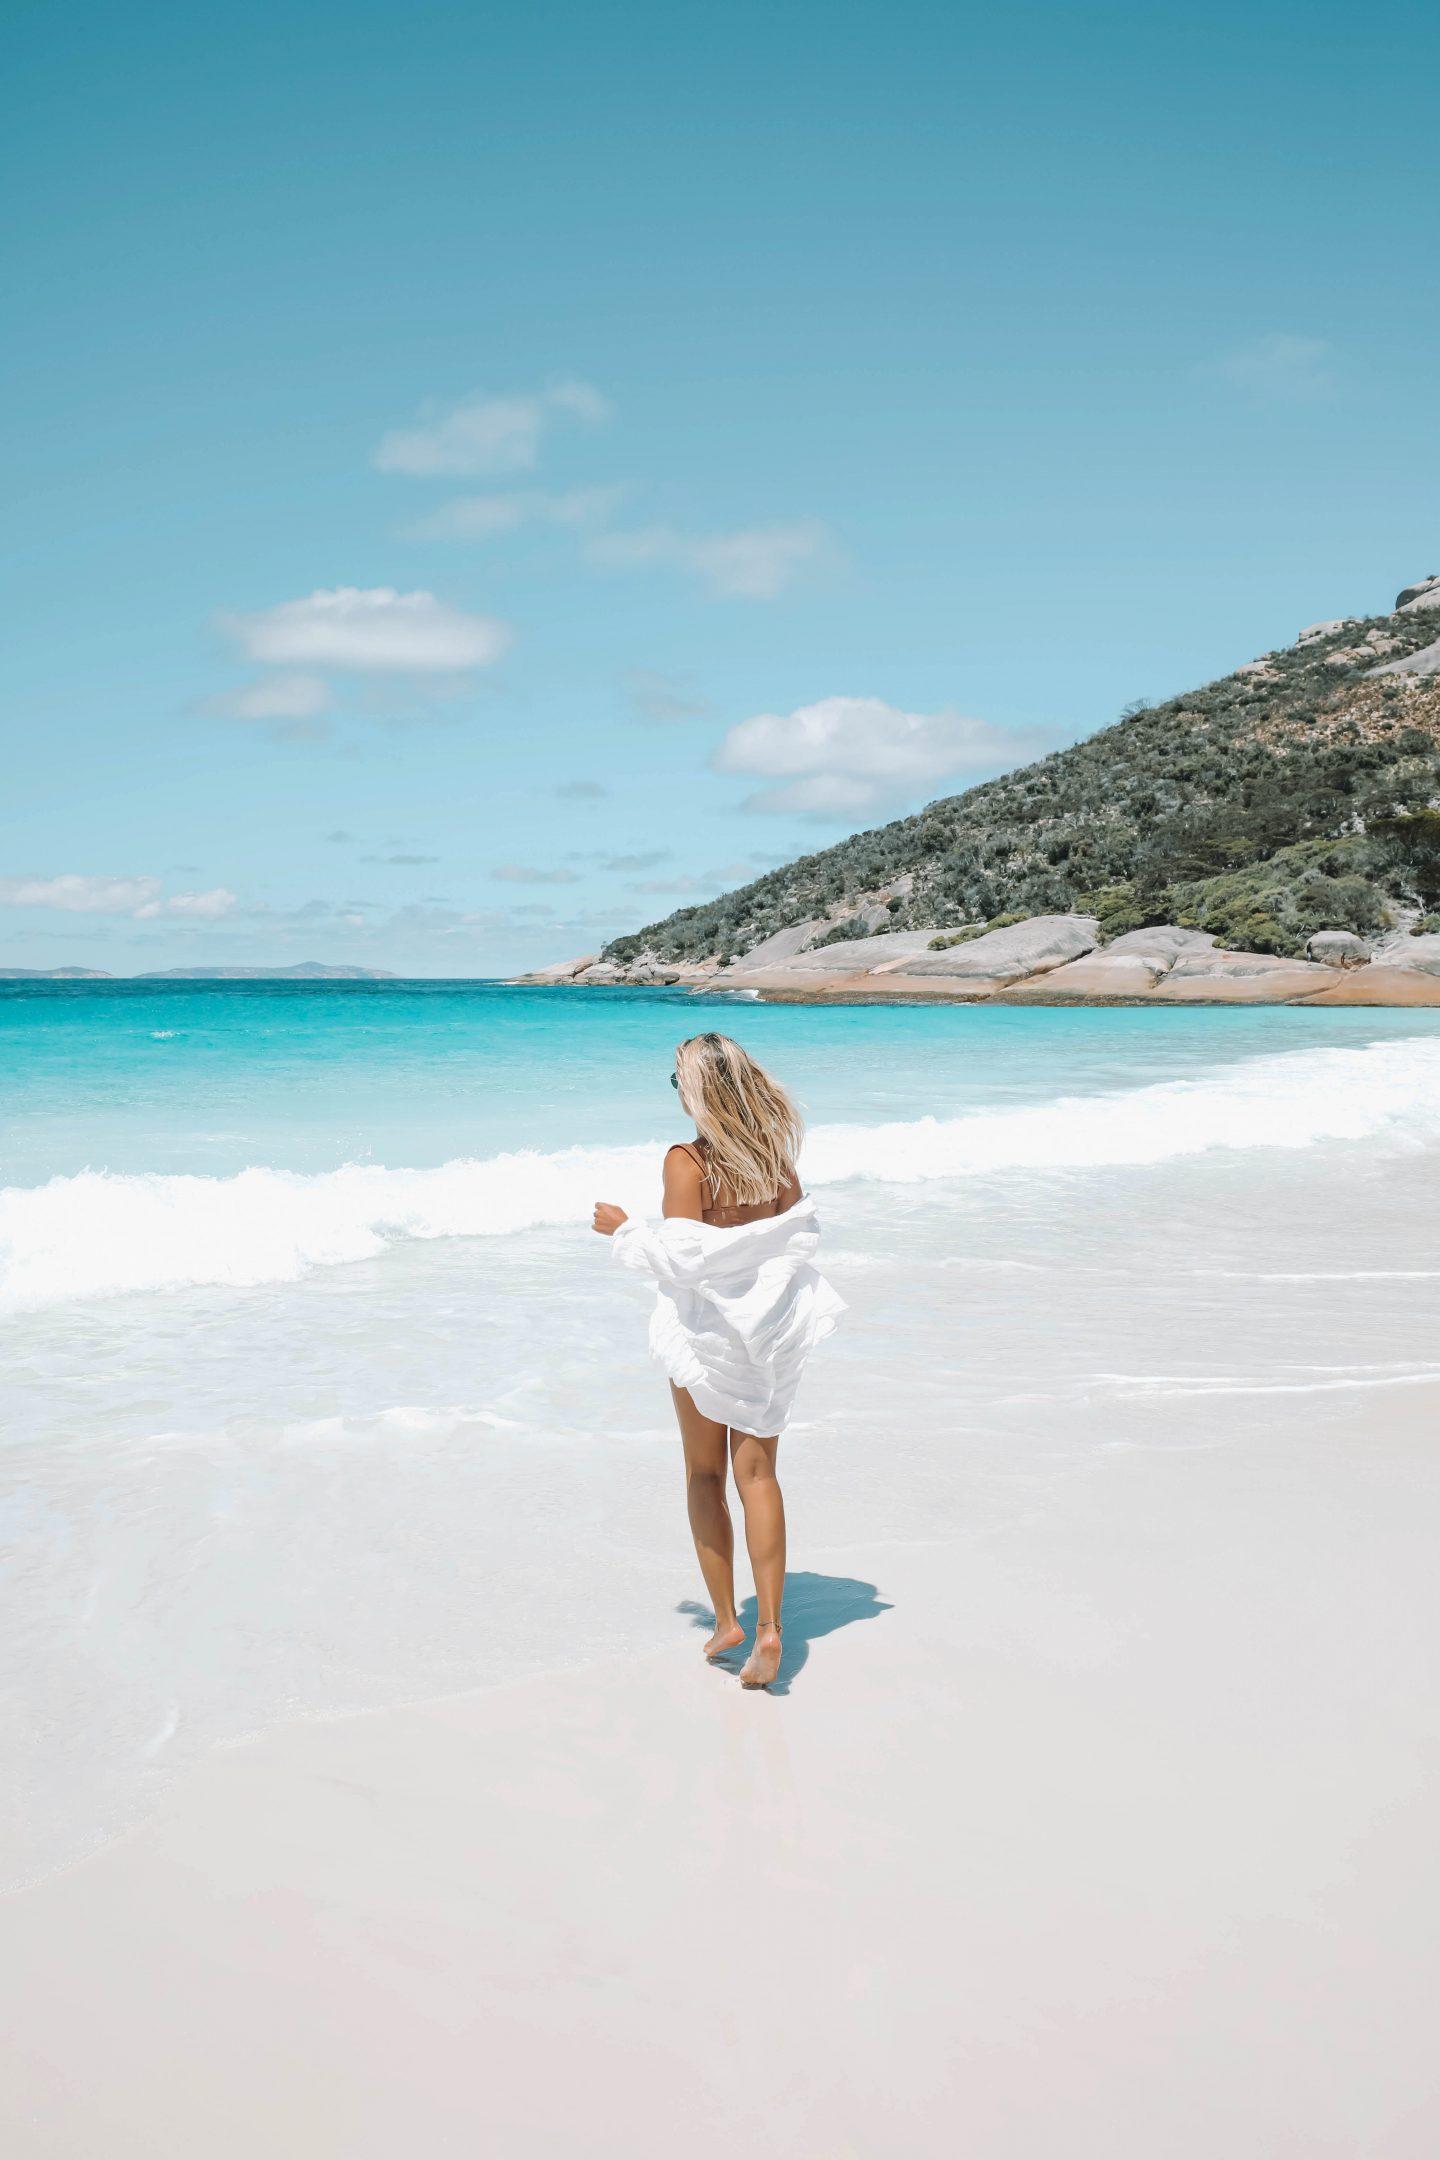 Plages Australie - Blondie Baby blog mode et voyages